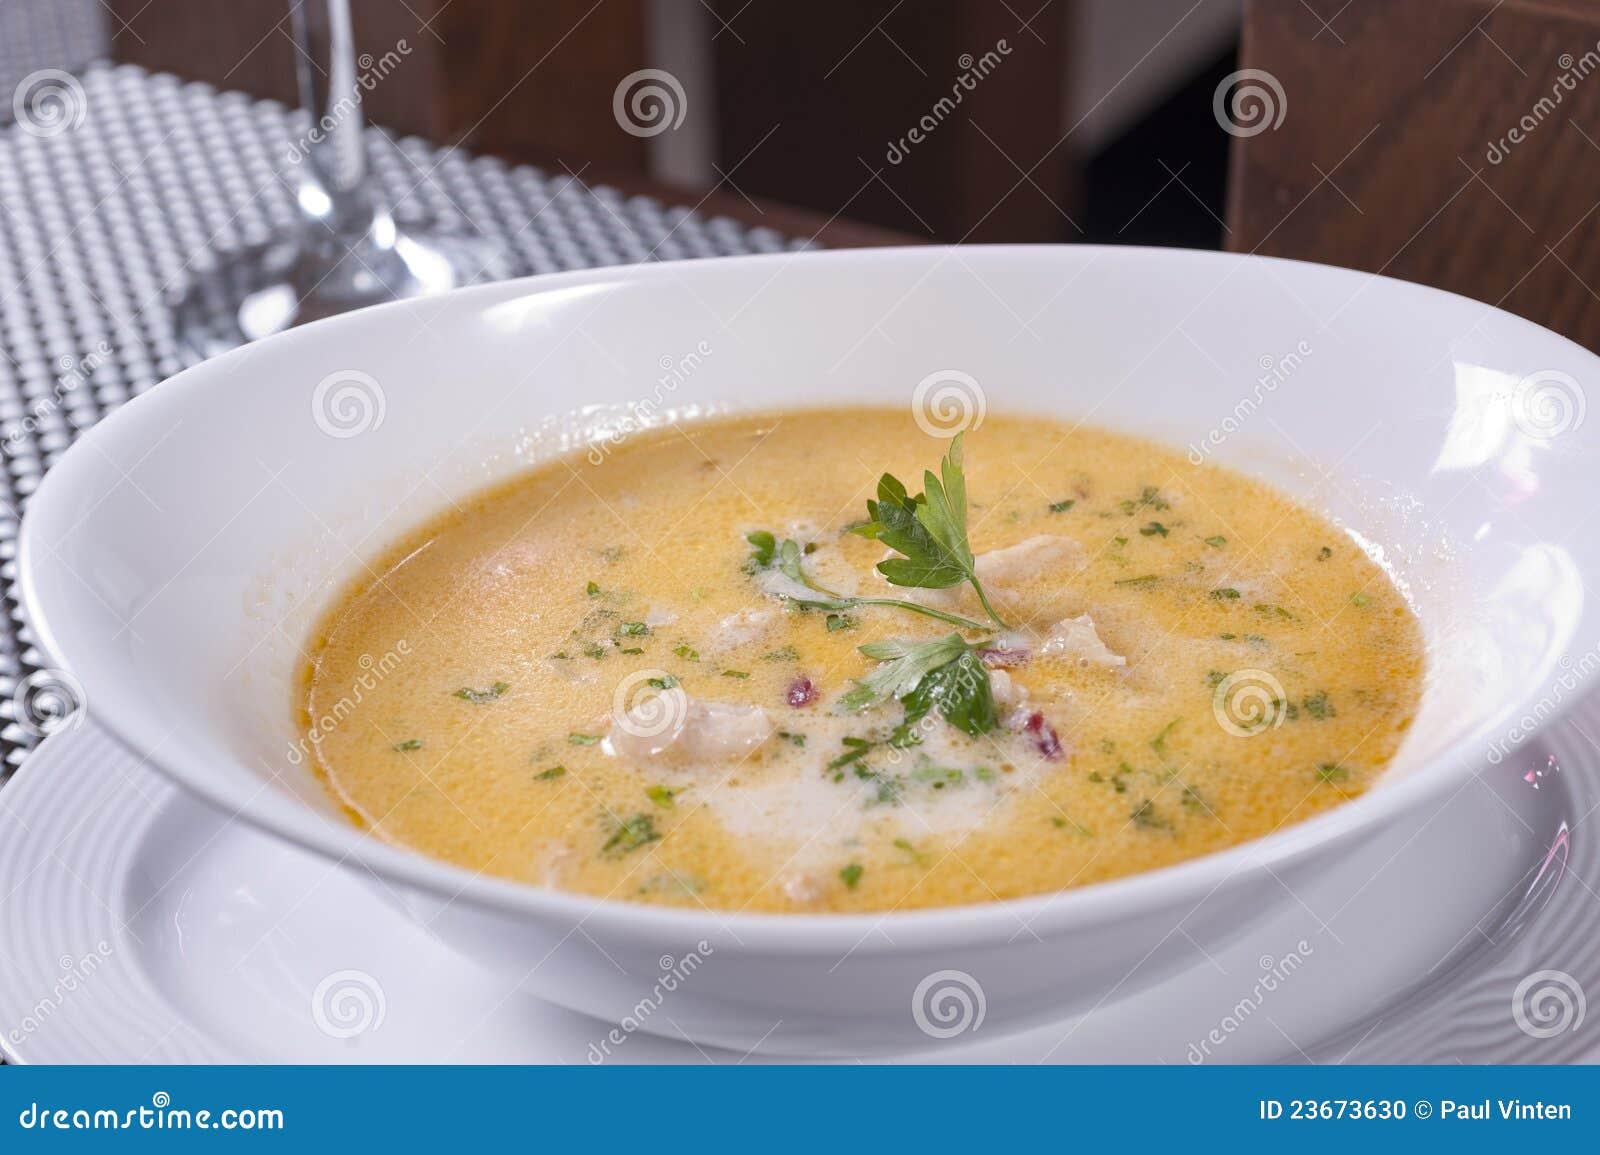 Mushroom Soup Clipart